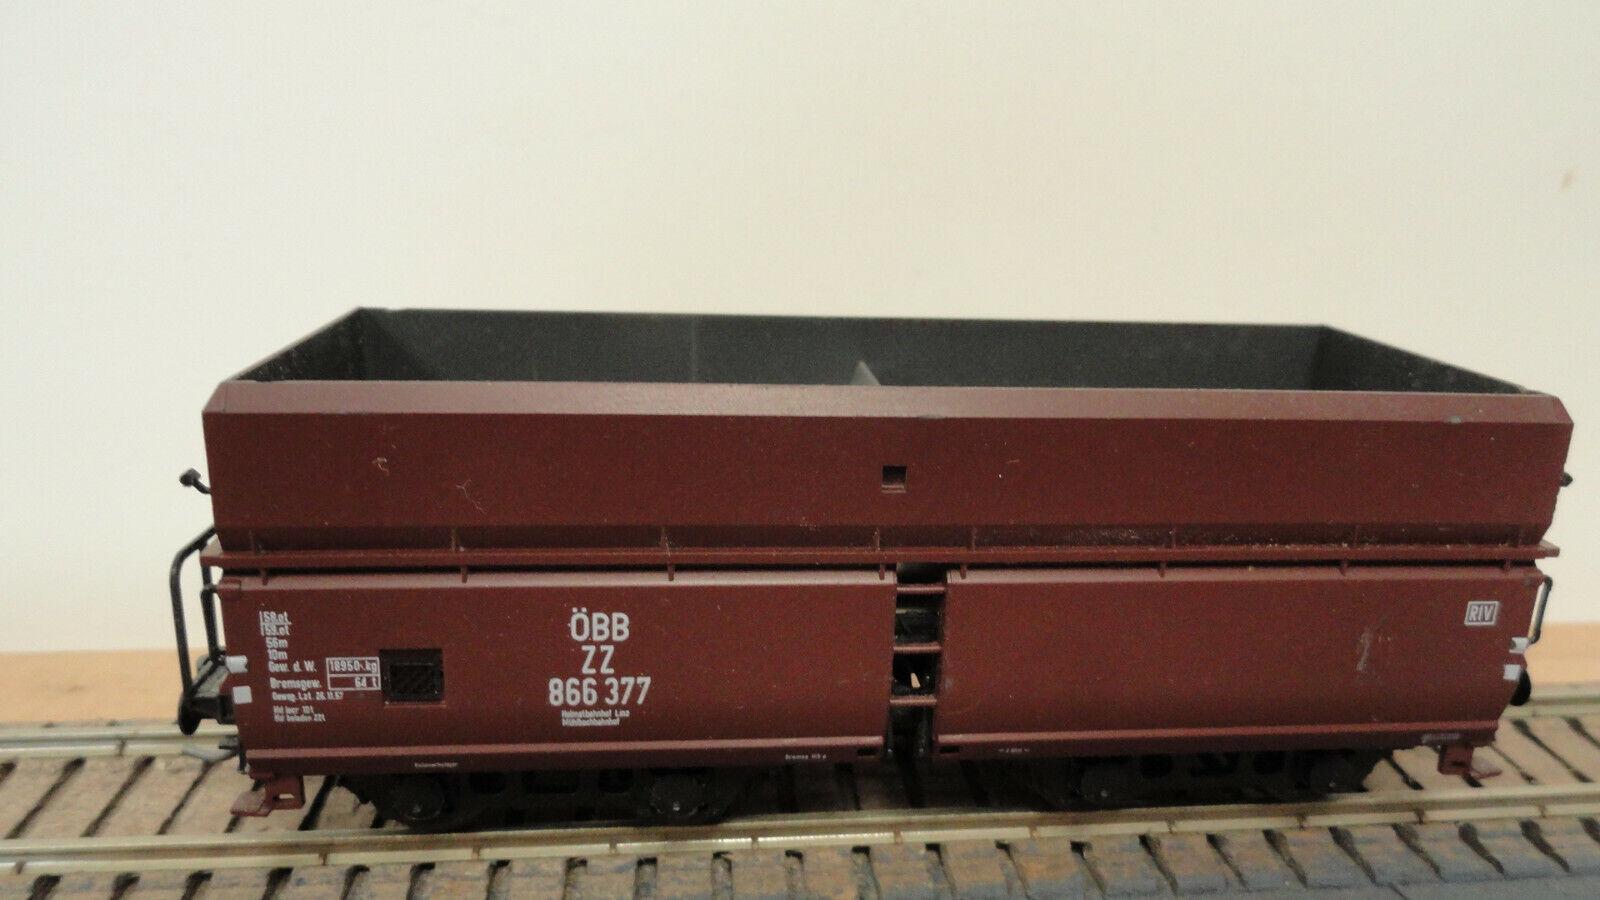 Unknown HO J003 OBB ZZ 866 377 hopper car w  Kadee & RP25. No original box